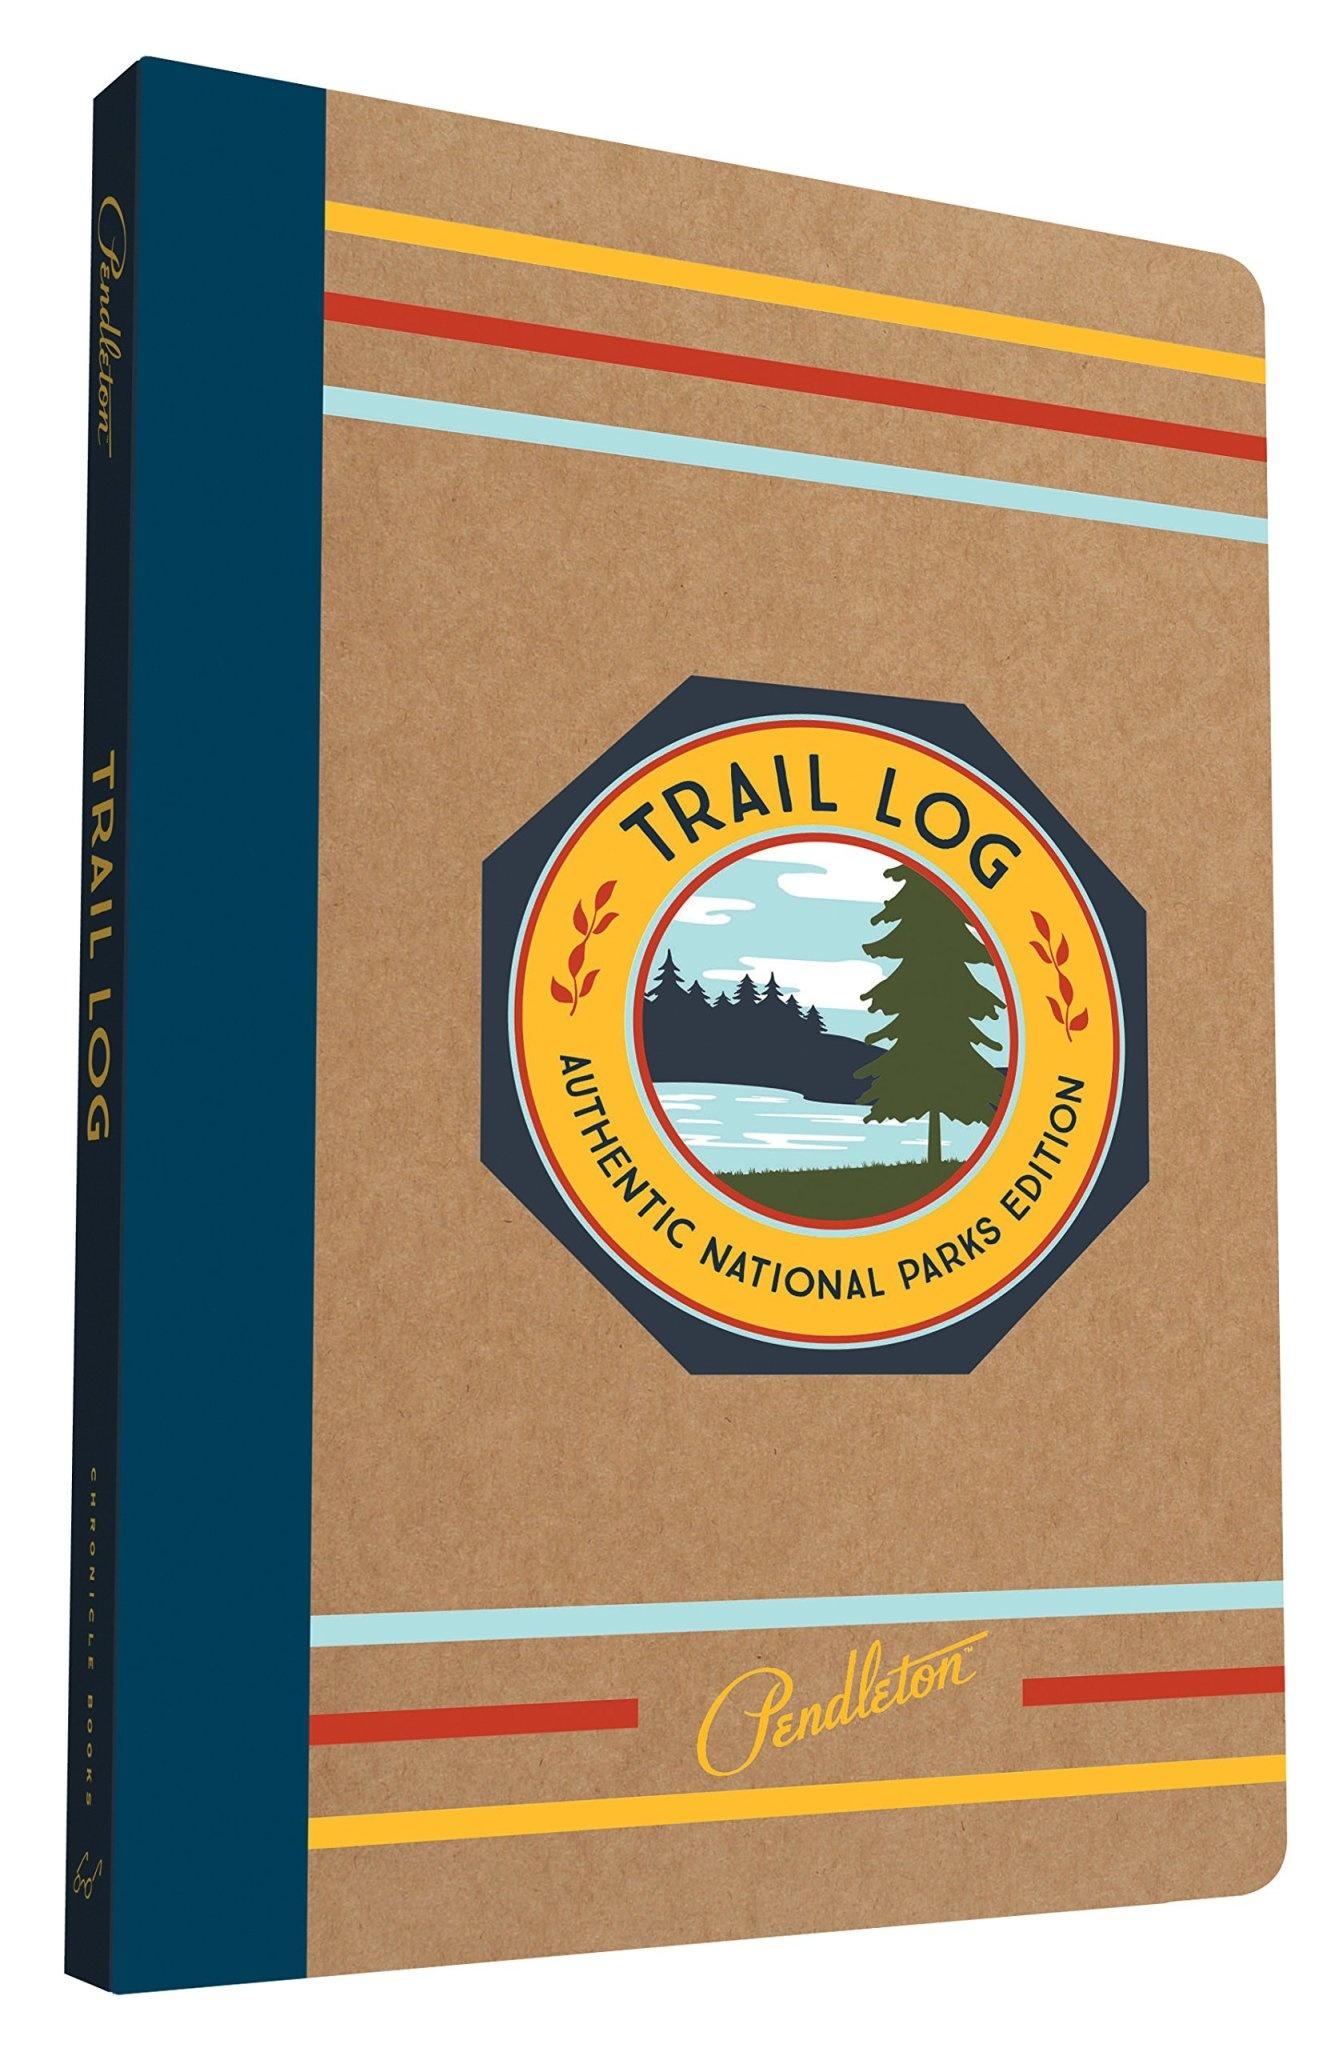 Pendleton Pendleton Trail Log: Authentic National Parks Edition